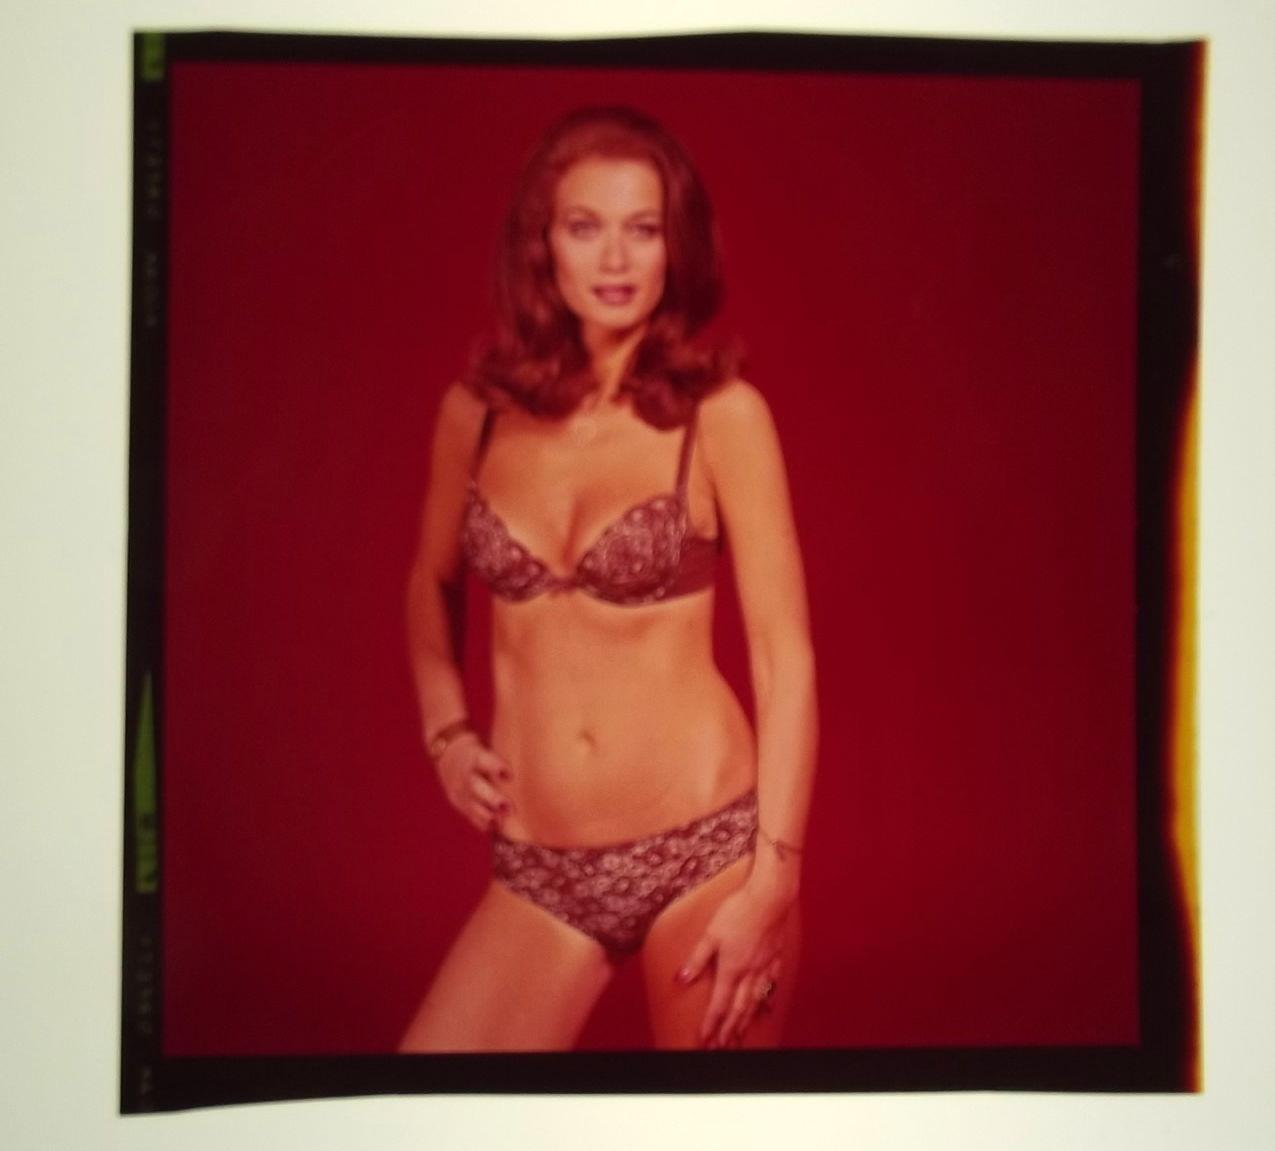 VALERIE LEON,JAMES BOND (SPY WHO LOVED ME) RARE SEXY BOND GIRL COLOR SLIDE SET